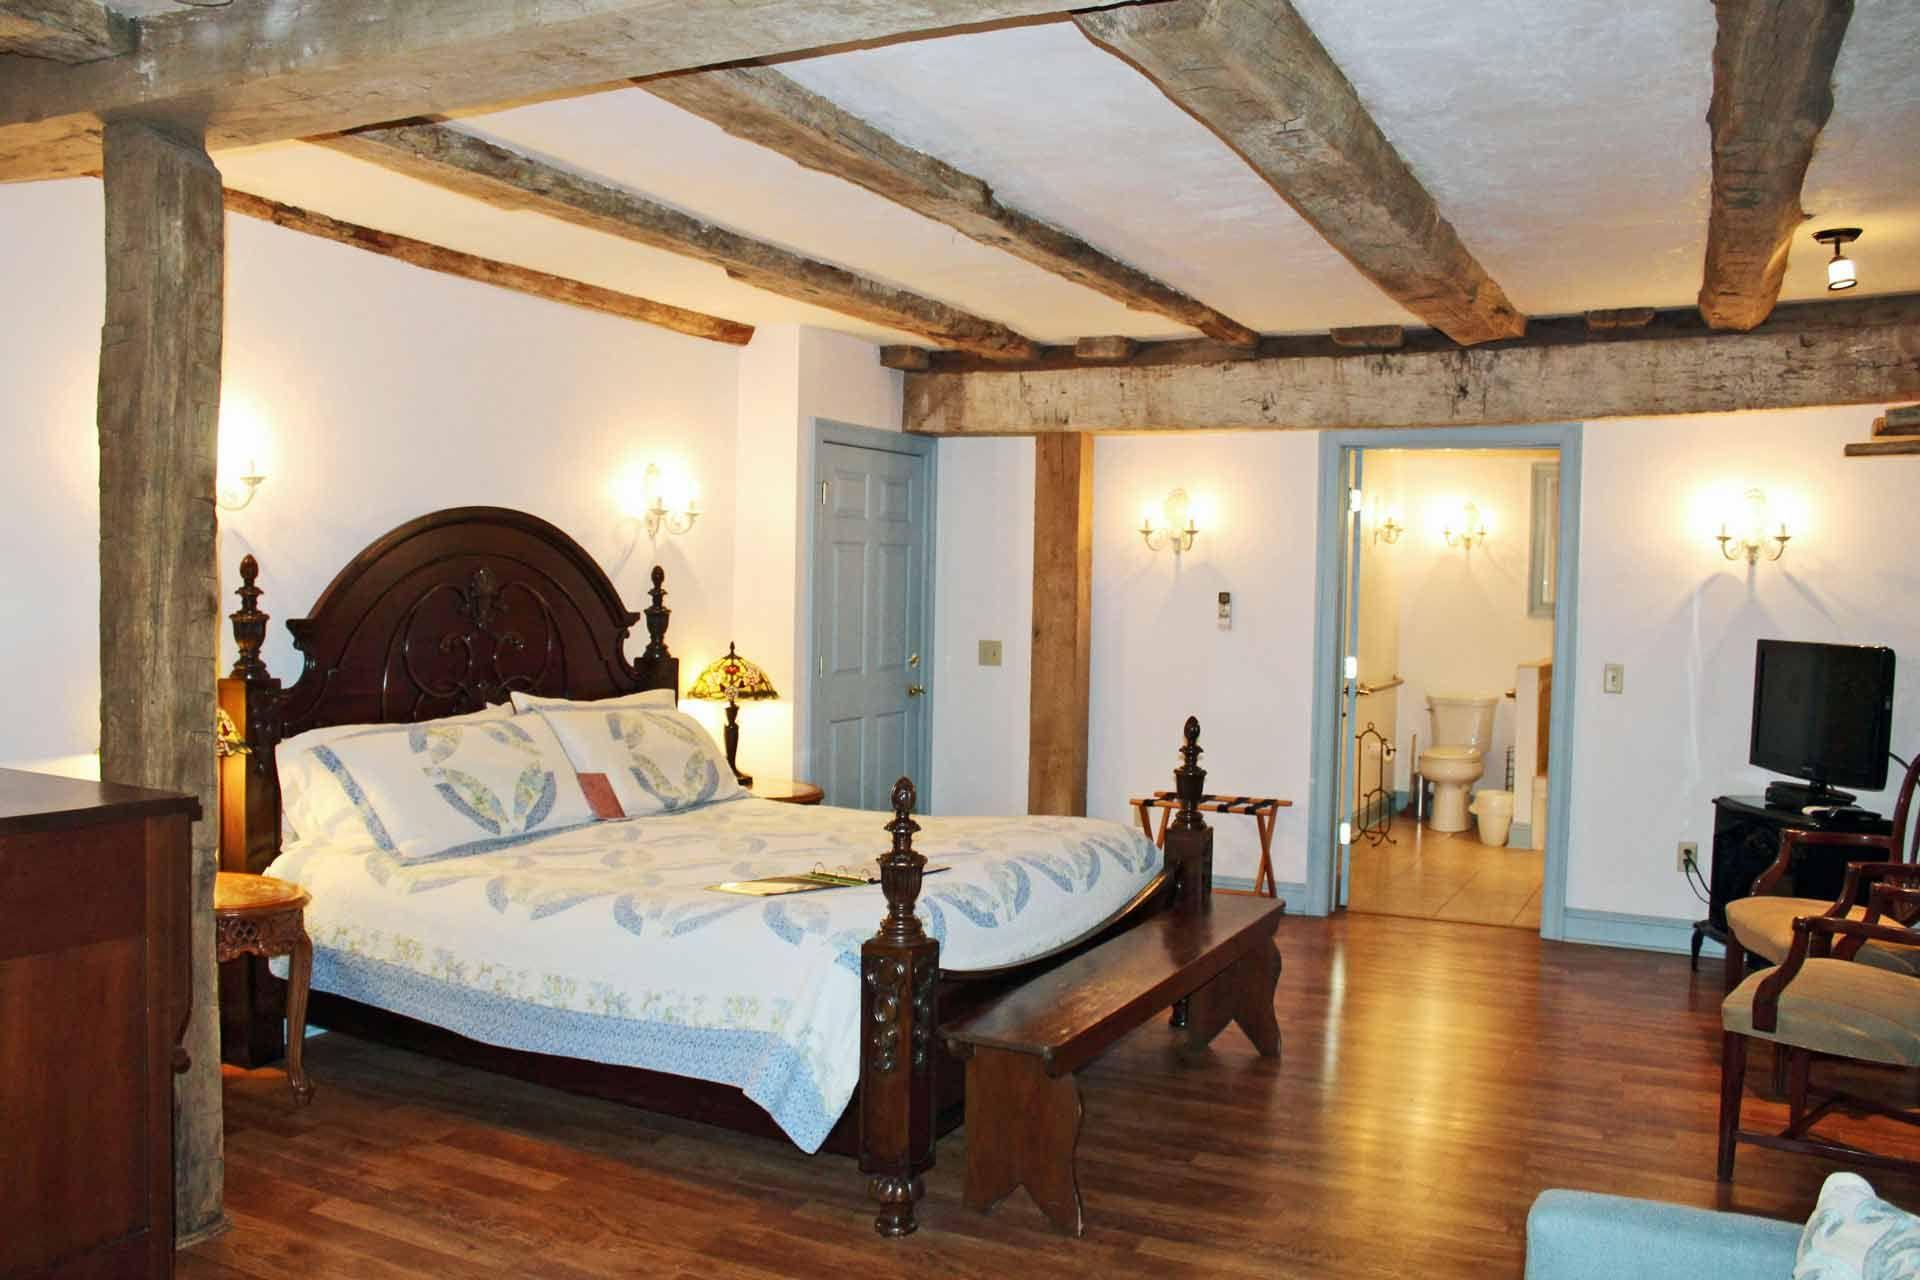 Gettysburg Battlefield Bed and Breakfast Inn Bed